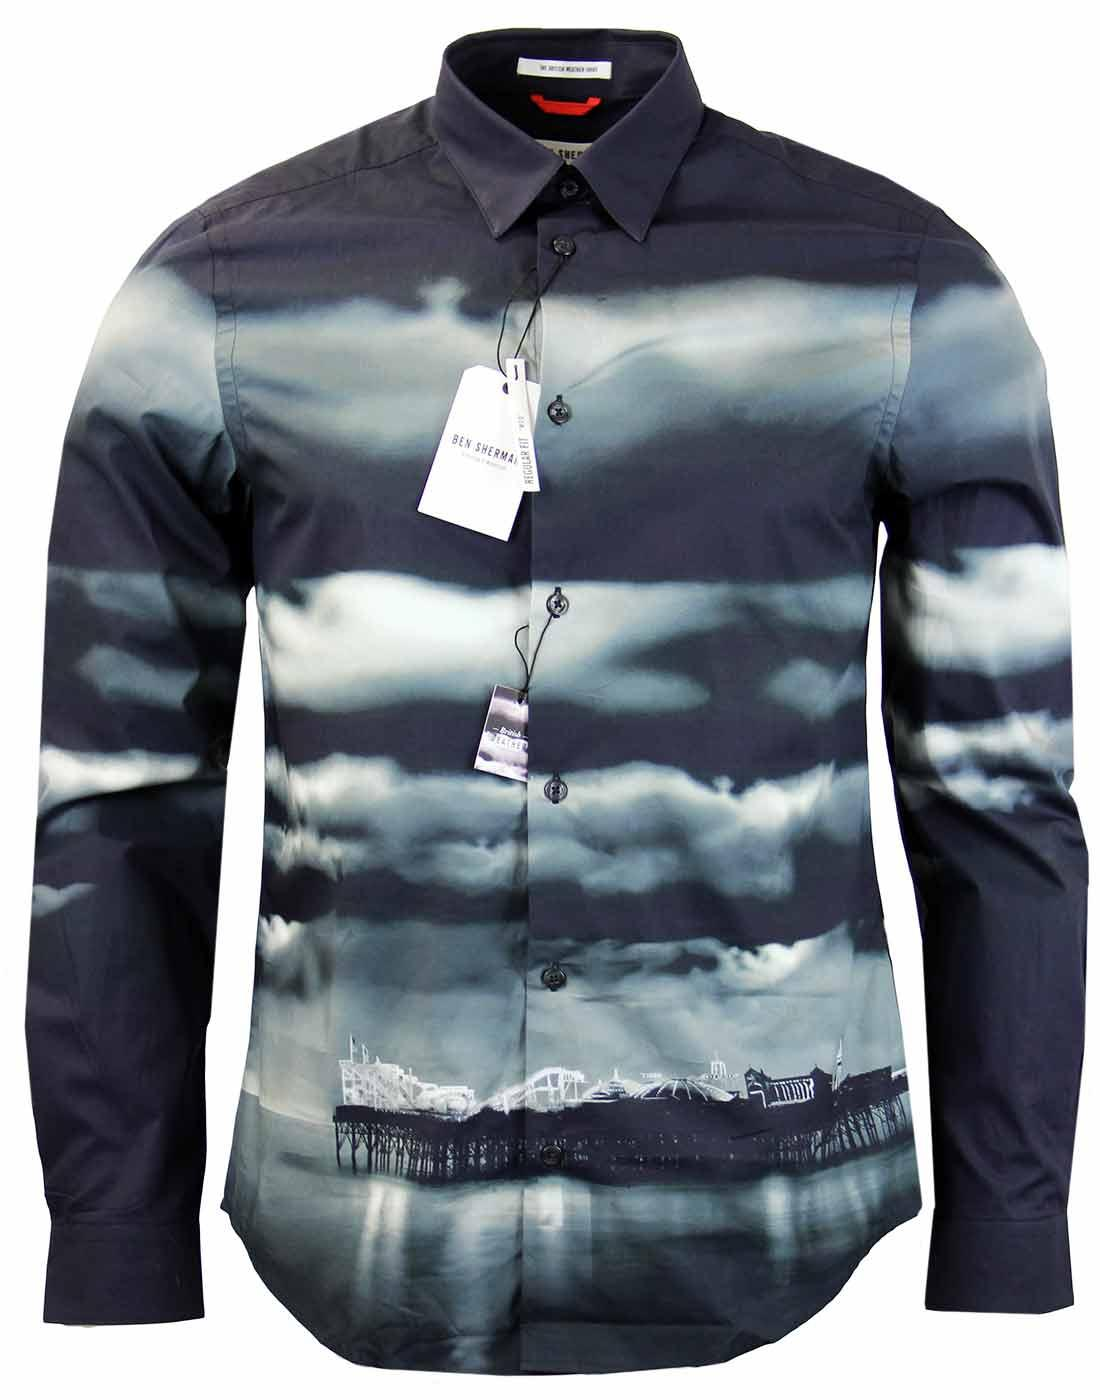 Ben sherman mod brighton beach print retro shirt jet black for Brighton t shirt printing